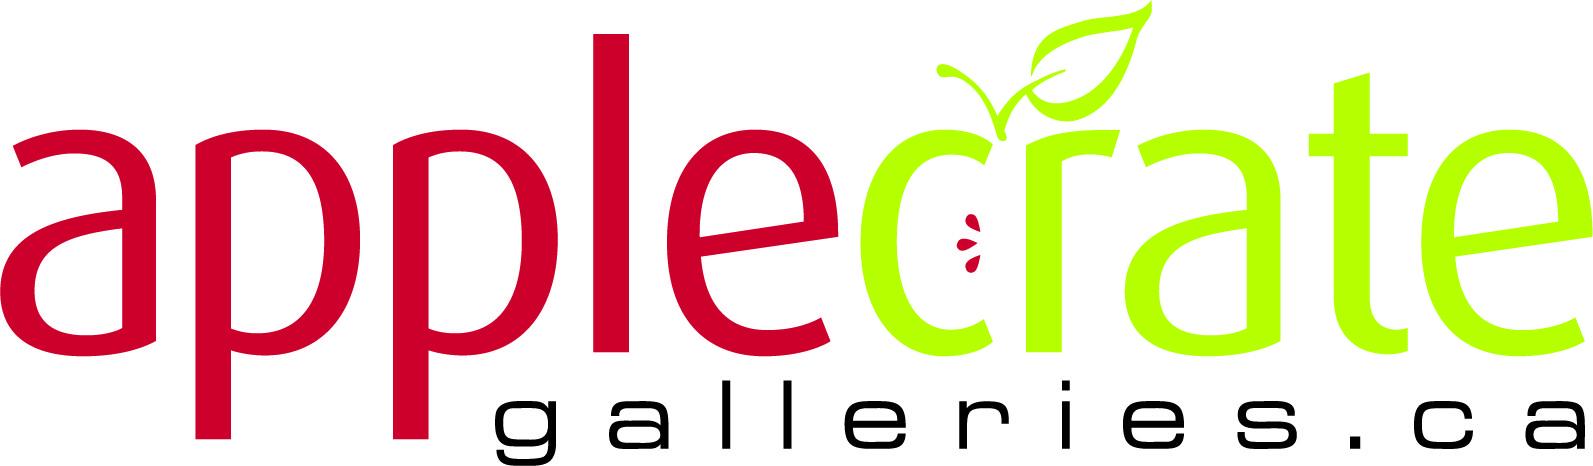 Applecrate Galleries logo - Business in Manotick